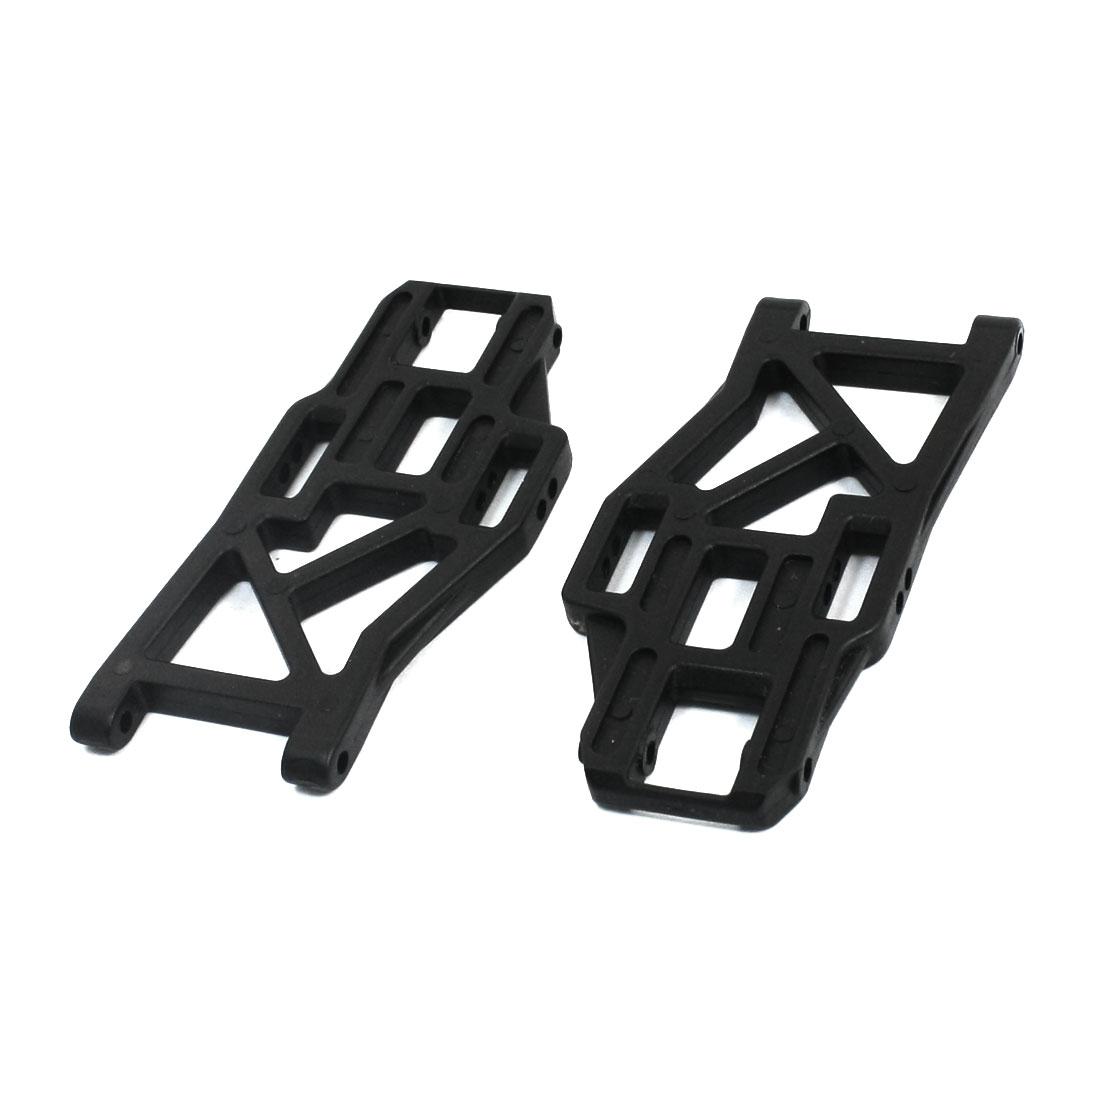 2pcs 08006 Rear Lower Suspension Arm for 94108/94111 RC 1/10 Model Car